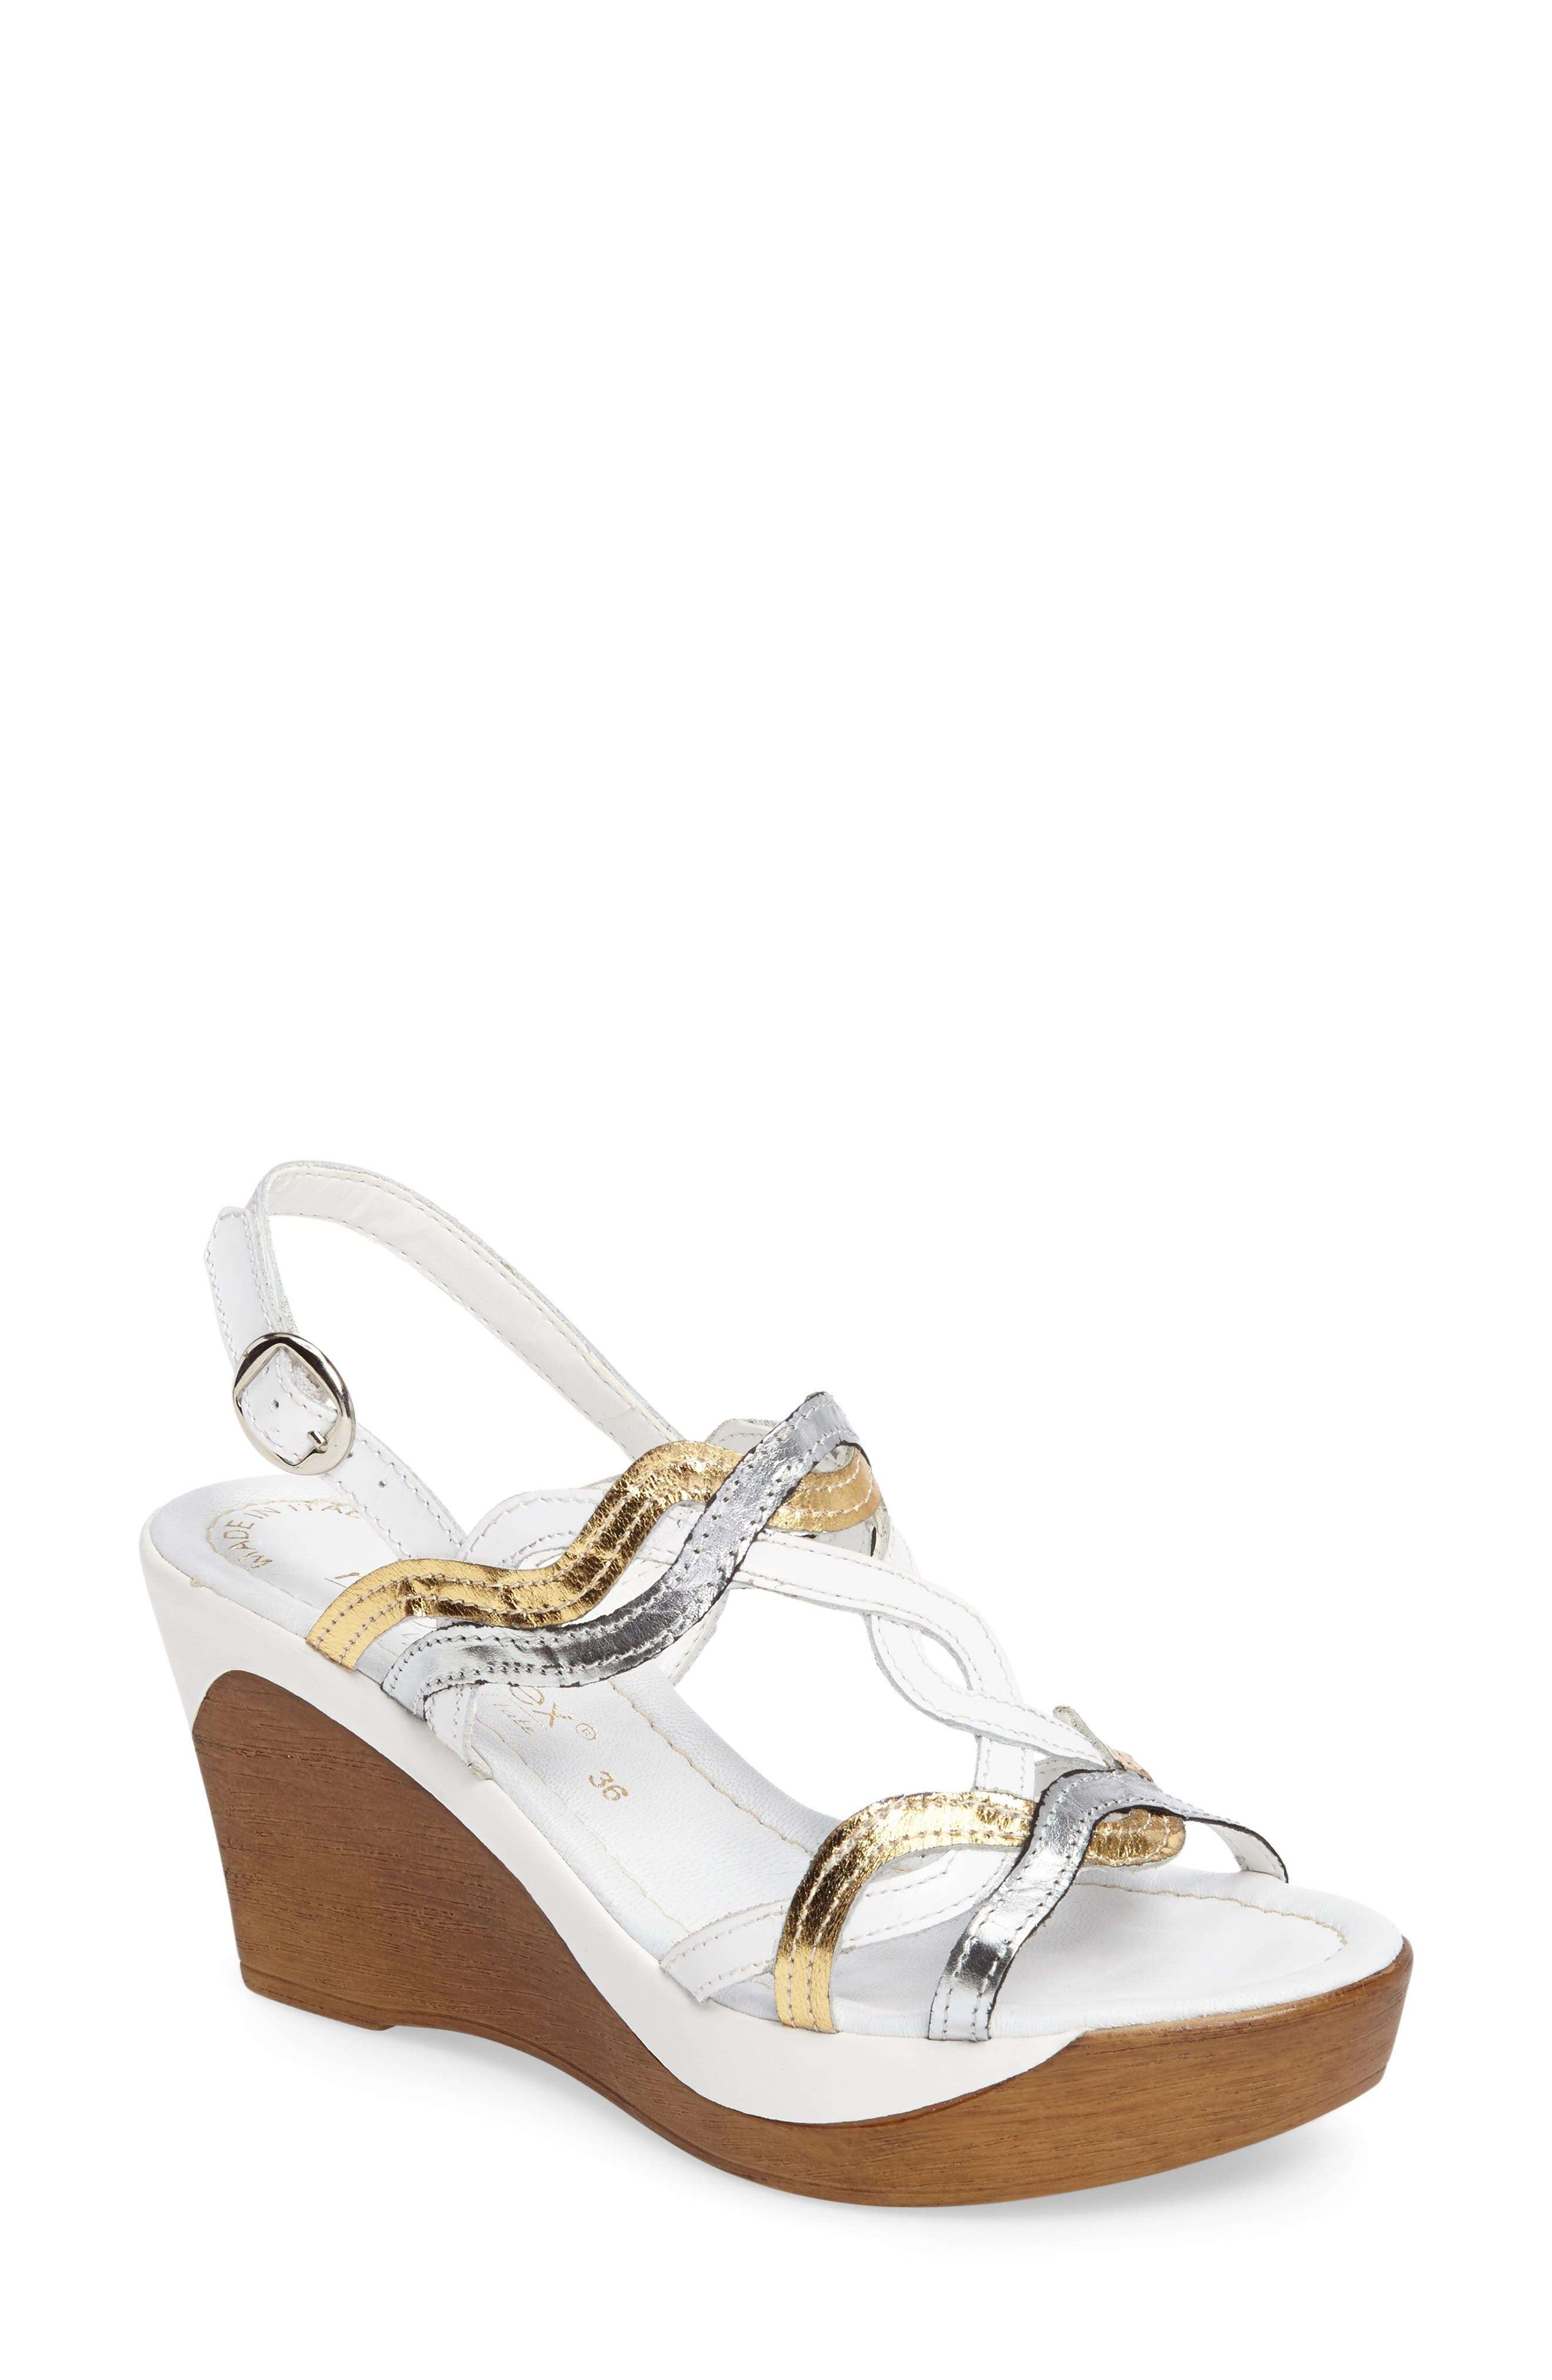 Alto Wedge Sandal,                             Main thumbnail 1, color,                             White Leather